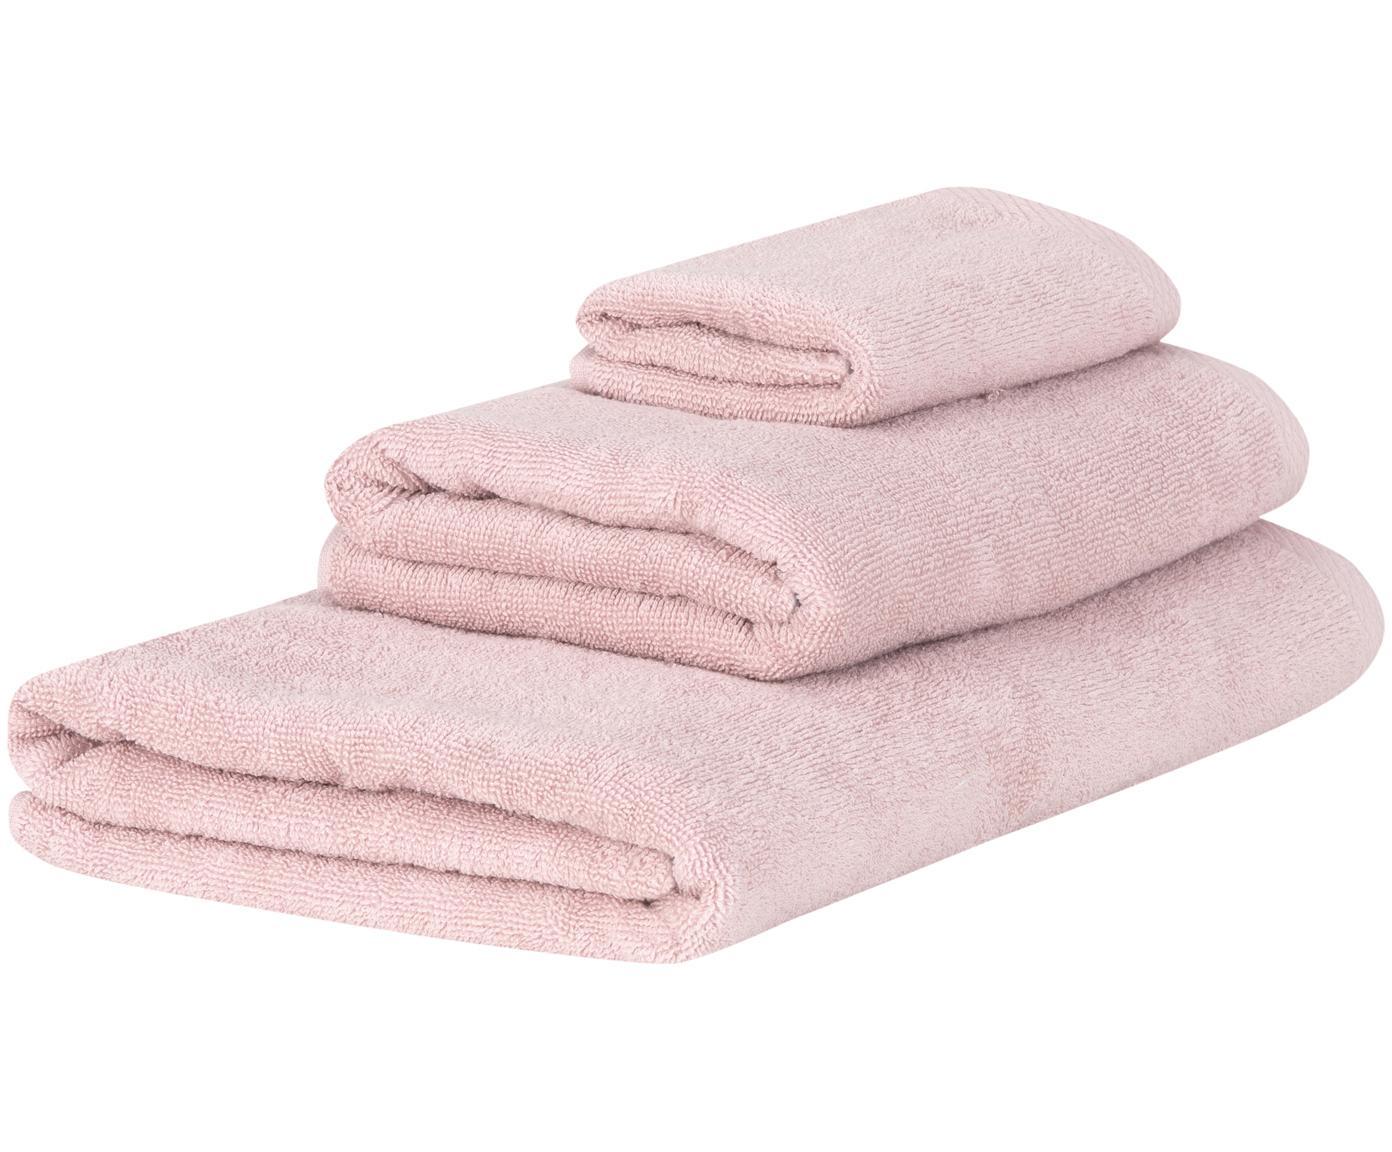 Set 3 asciugamani Comfort, Rosa cipria, Diverse dimensioni